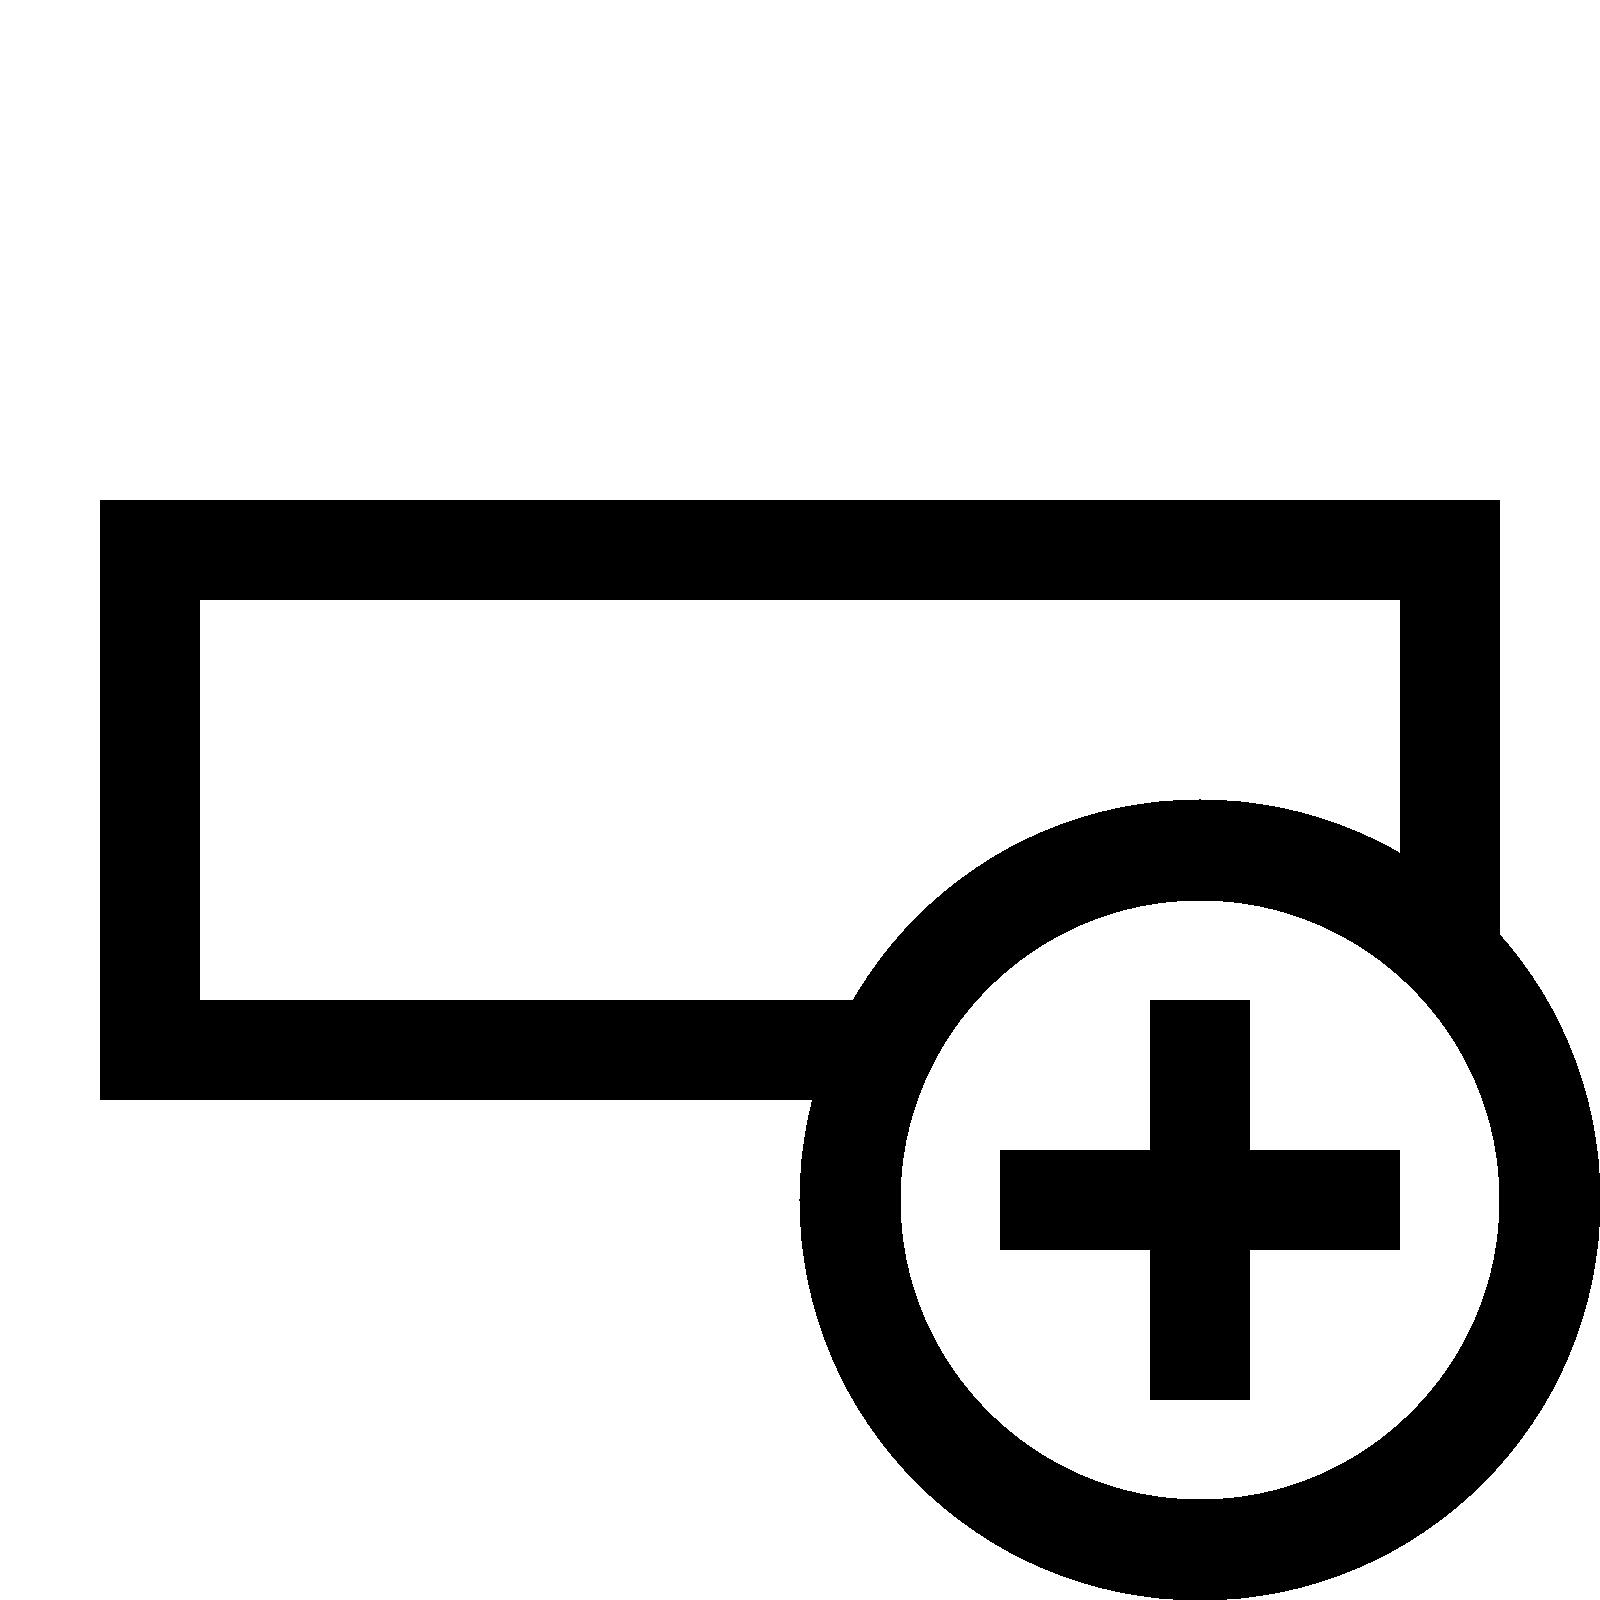 Bat clipart row At Free Icons8 icon Row